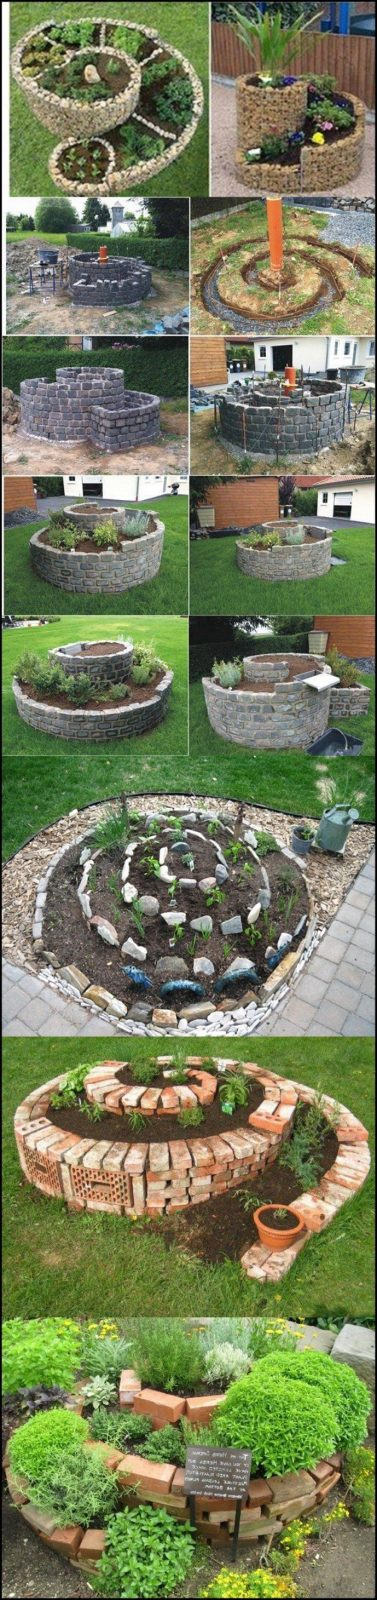 Den Garten Individuell Gestalten Kräutergarten Anlegen Anleitung von Naturgarten Anlegen Bepflanzen Gestalten Bild